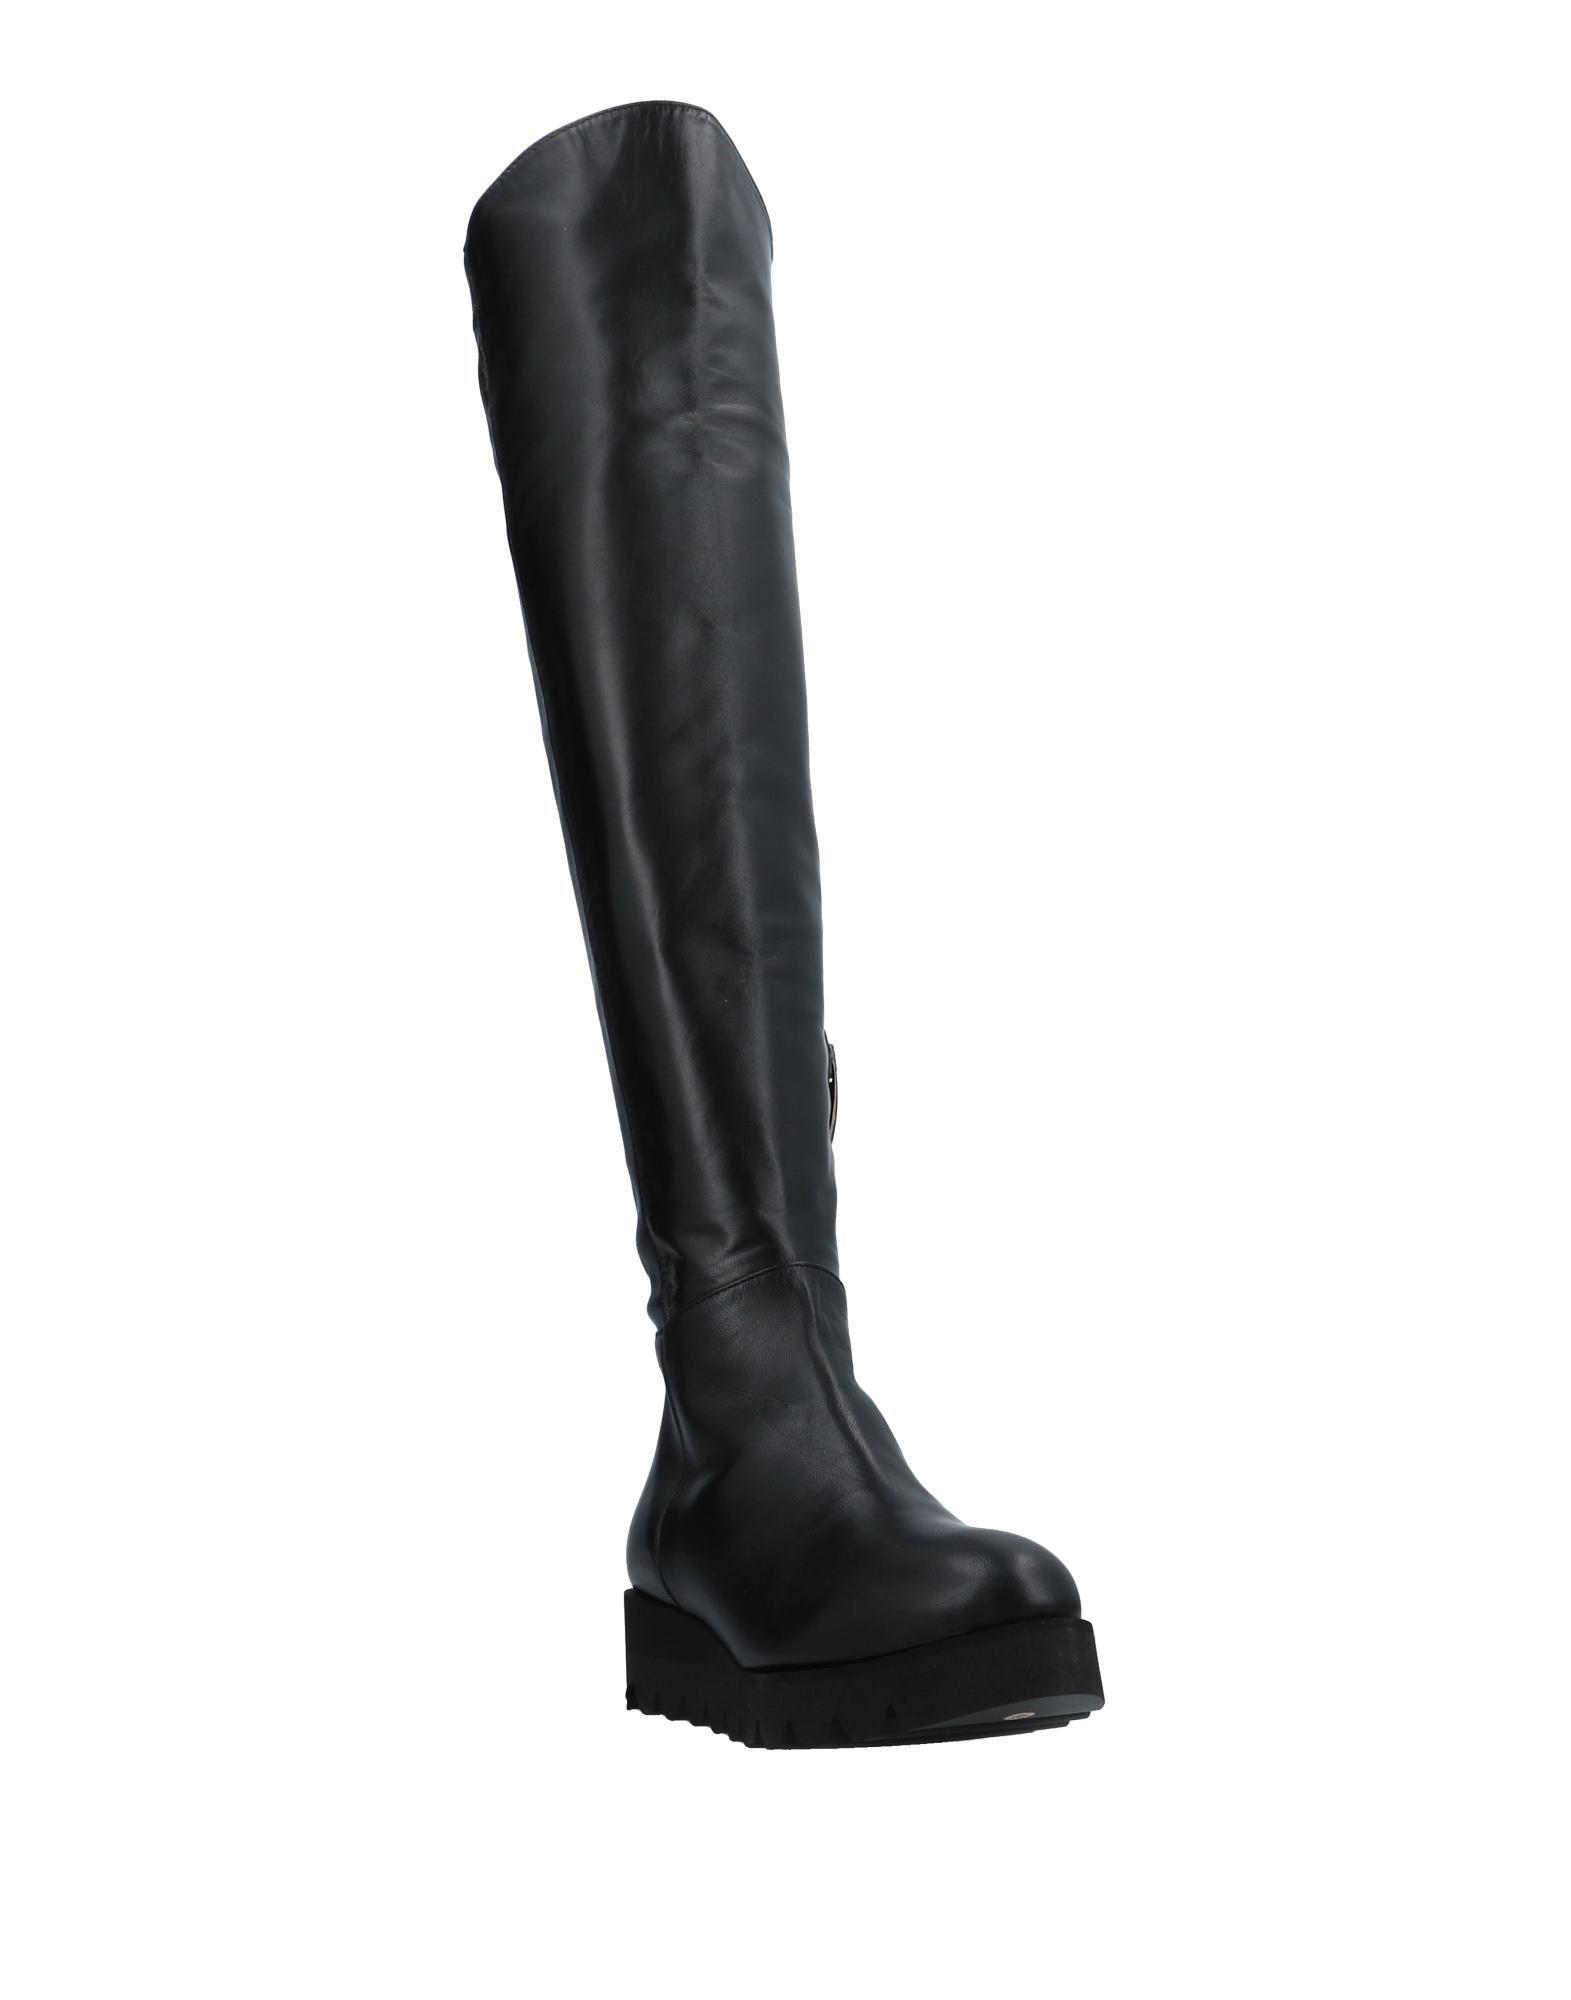 Stilvolle billige Schuhe Schuhe Schuhe Jet 11512601JT 3dbea5